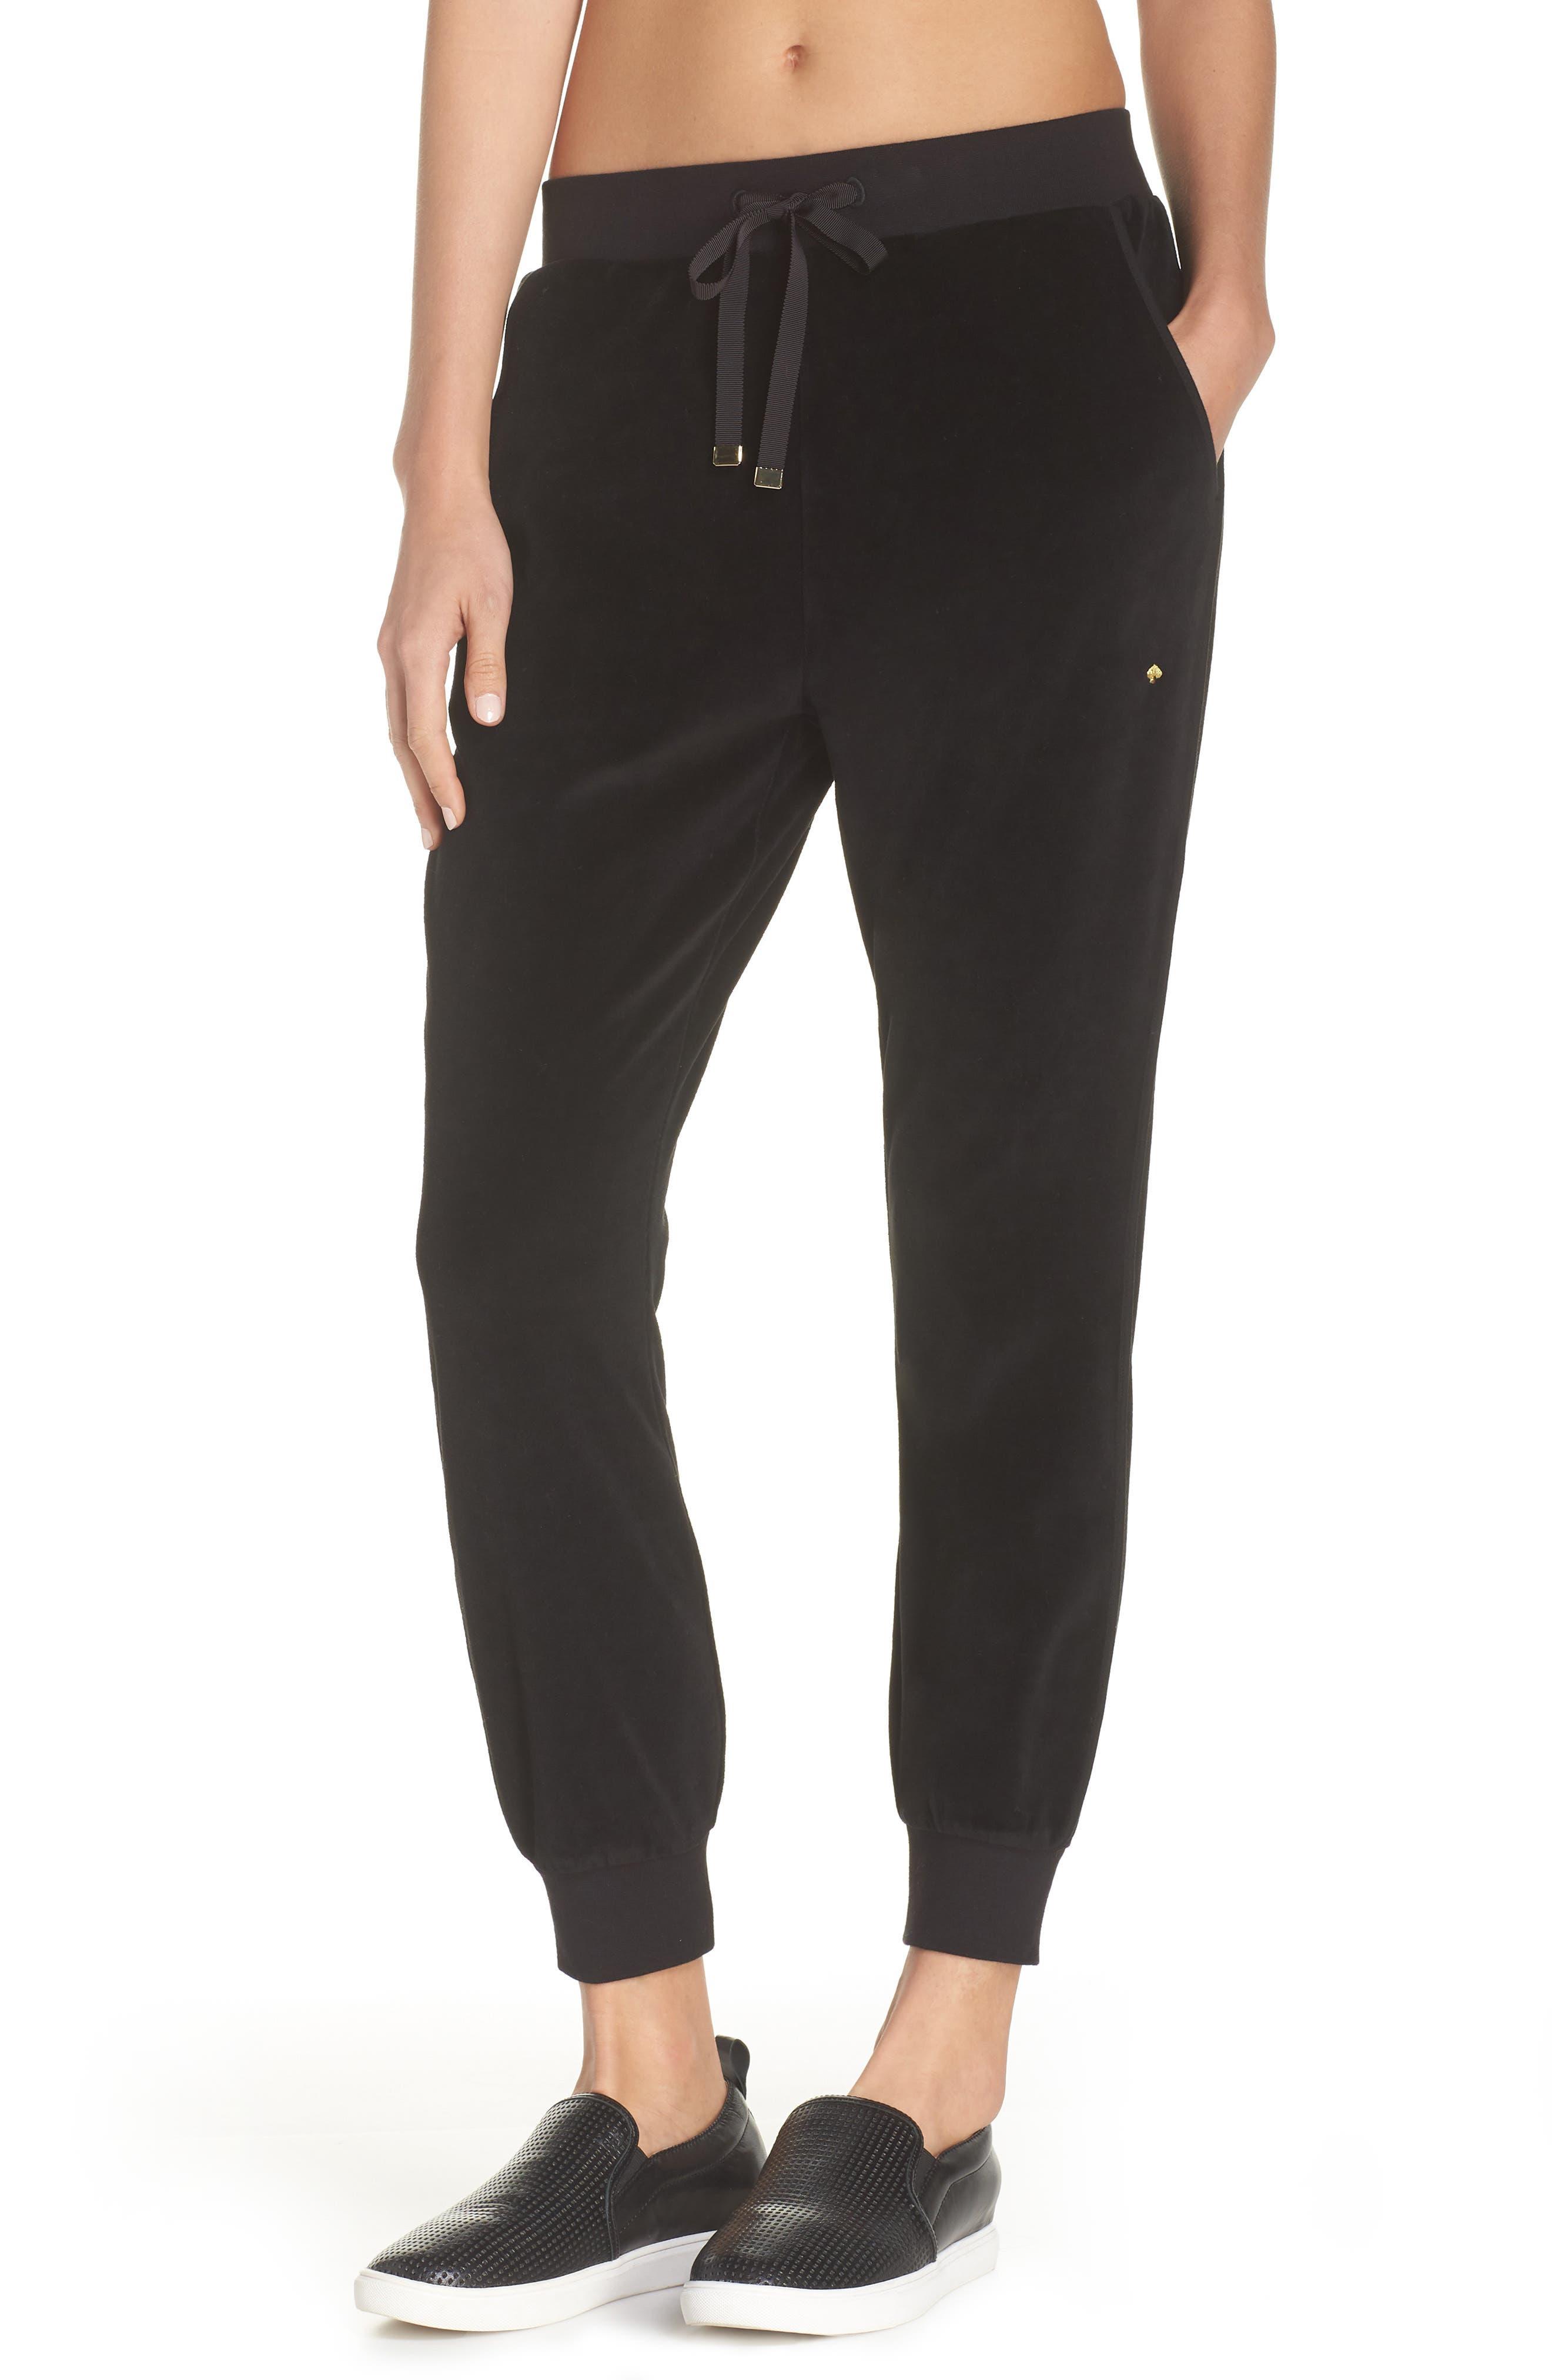 Velour Drawstring Jogger Pants in Black